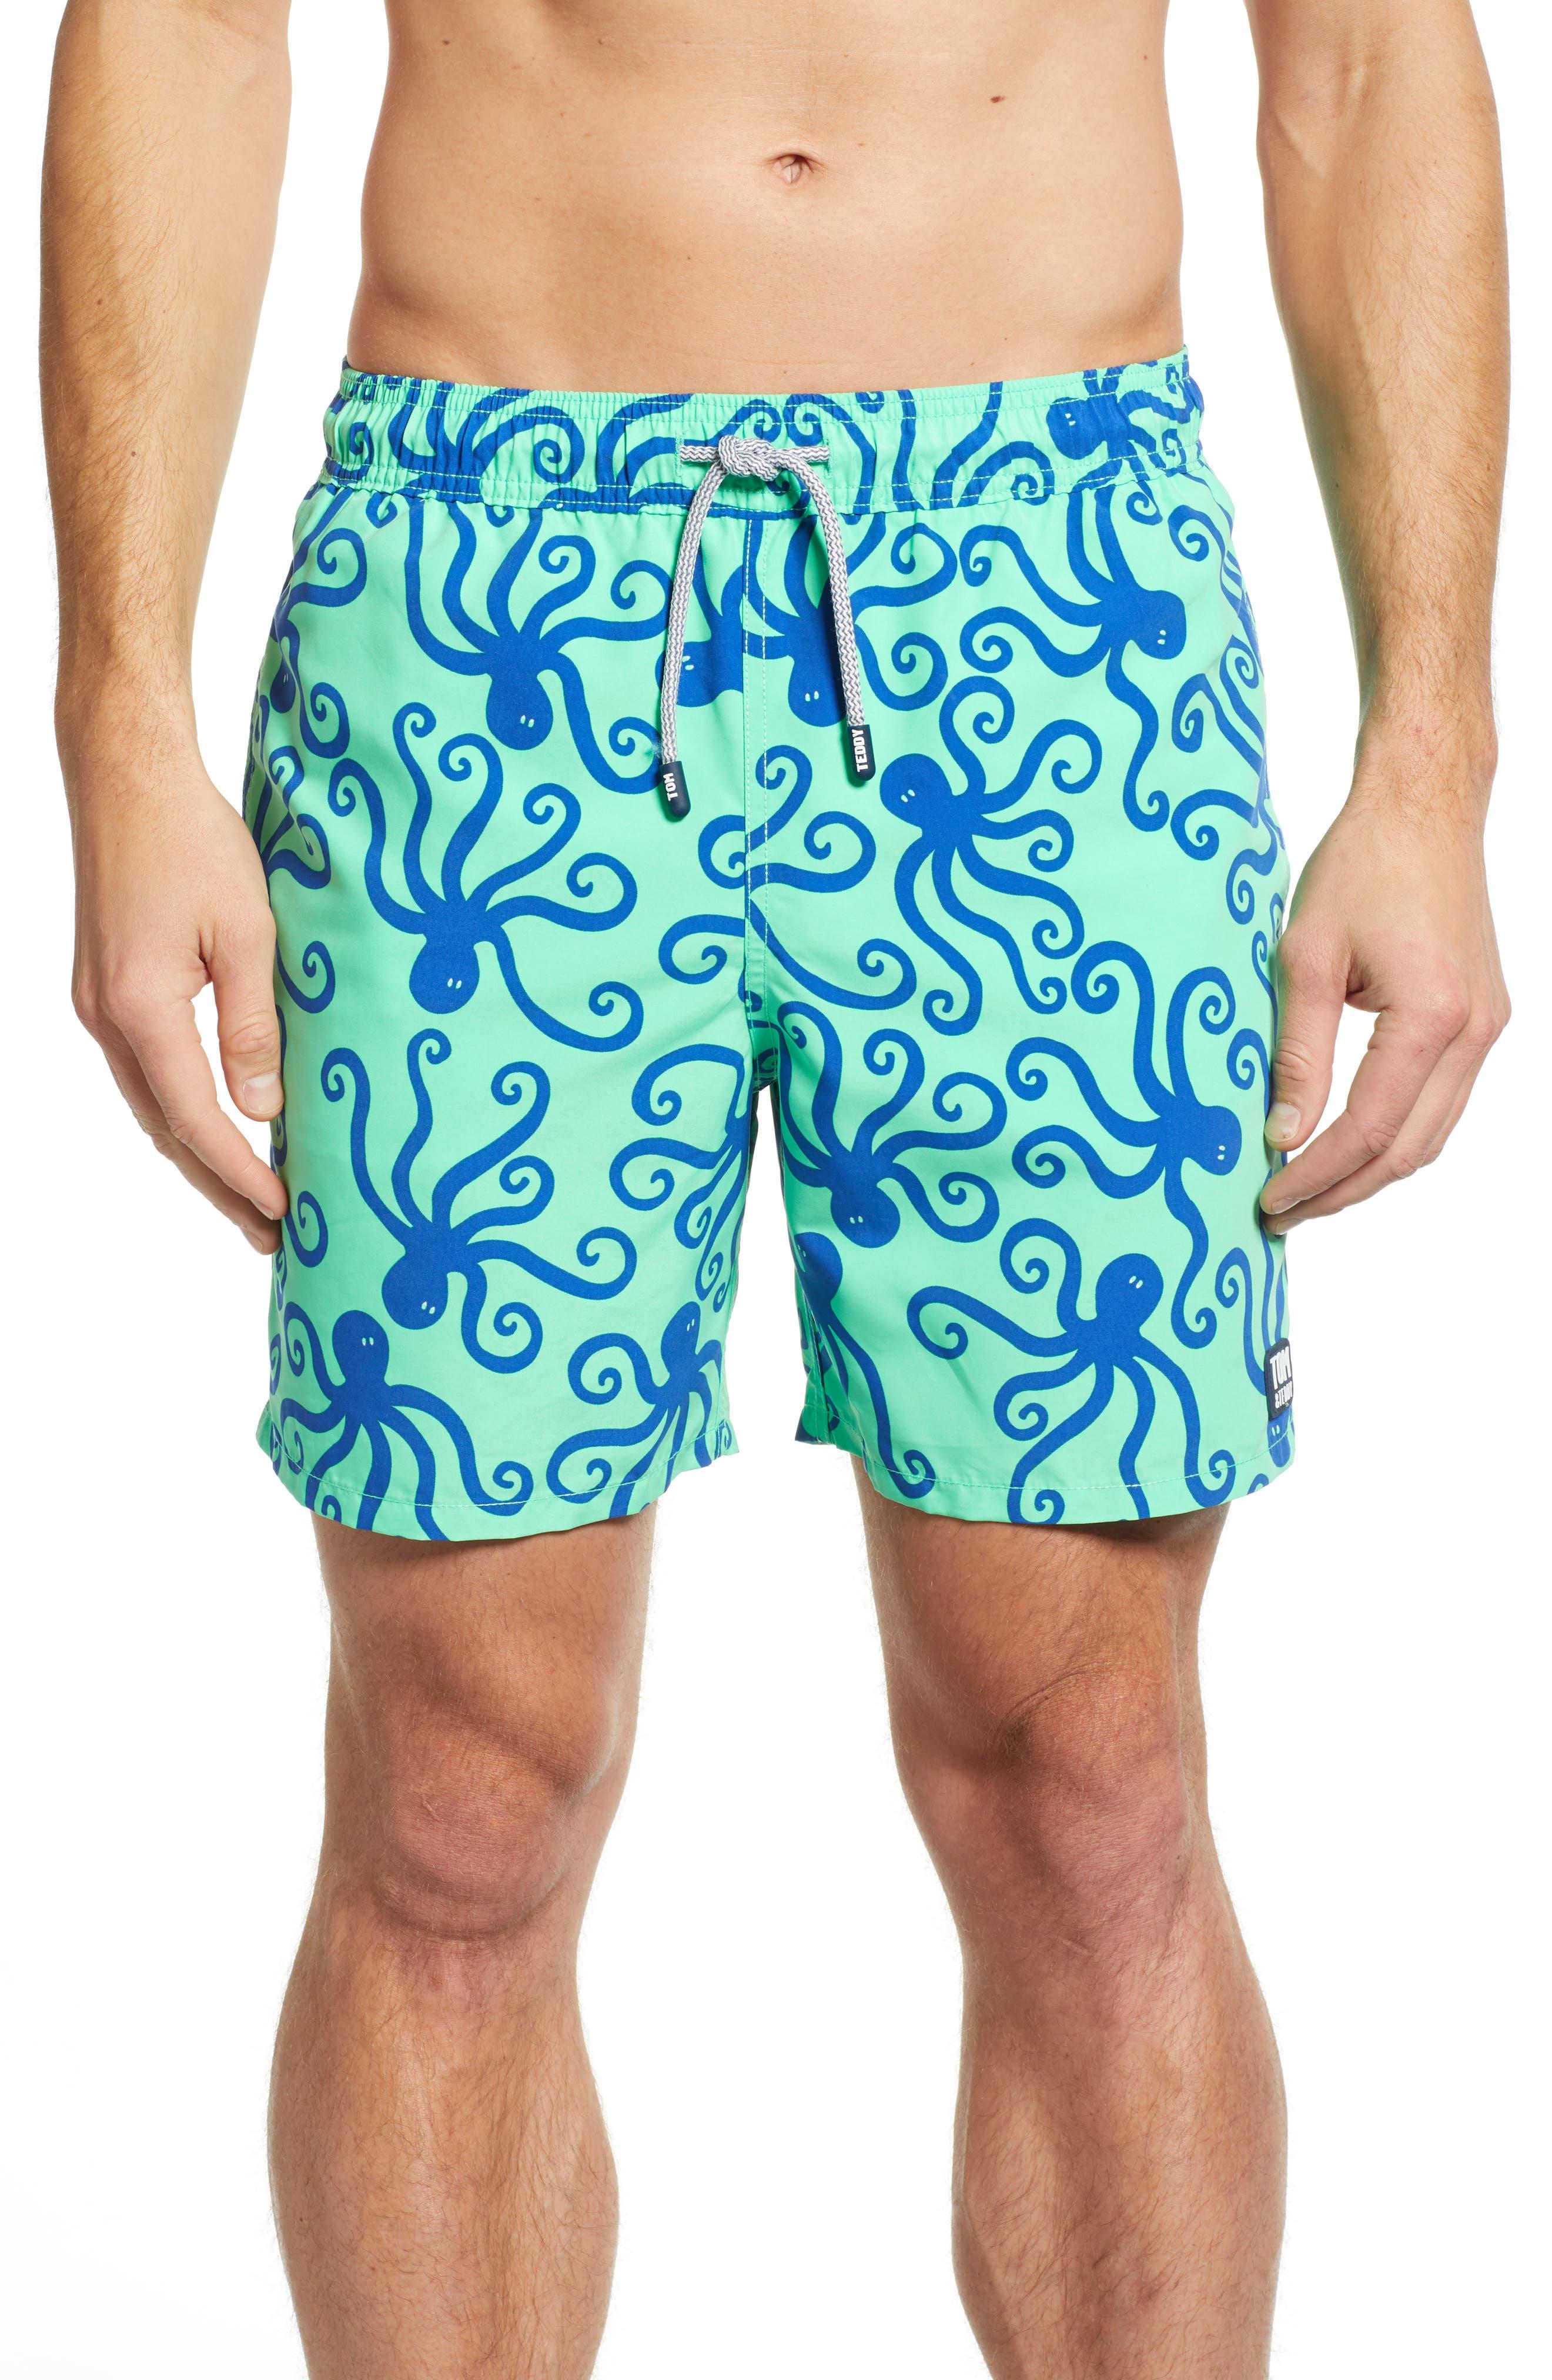 TOM & TEDDY, 'Octopus Pattern' Swim Trunks, Main thumbnail 1, color, GREEN/ BLUE